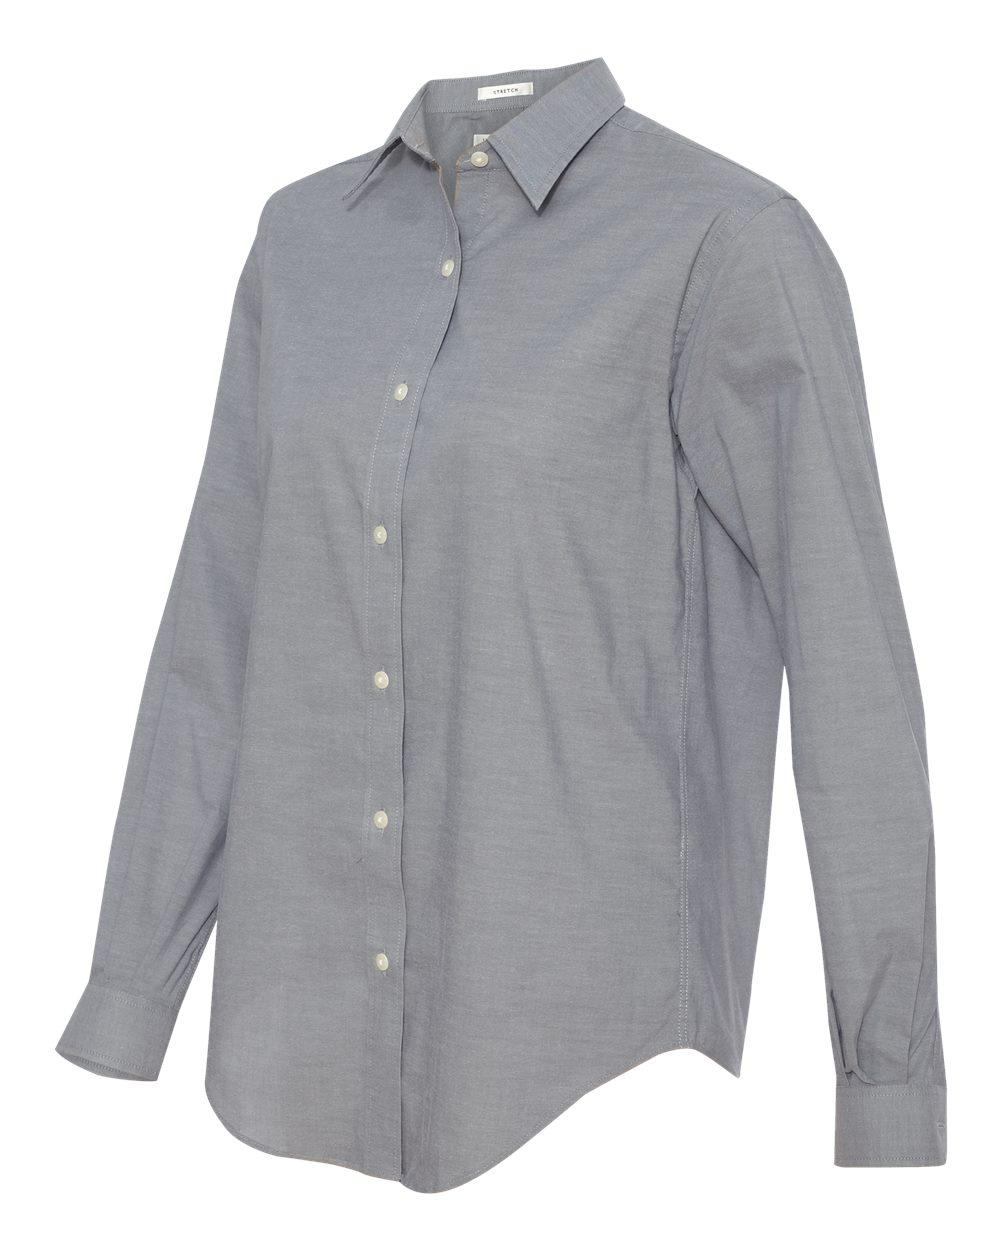 Van Heusen 13V0238 Ladies' Stretch Pinpoint Spread Collar Shirt